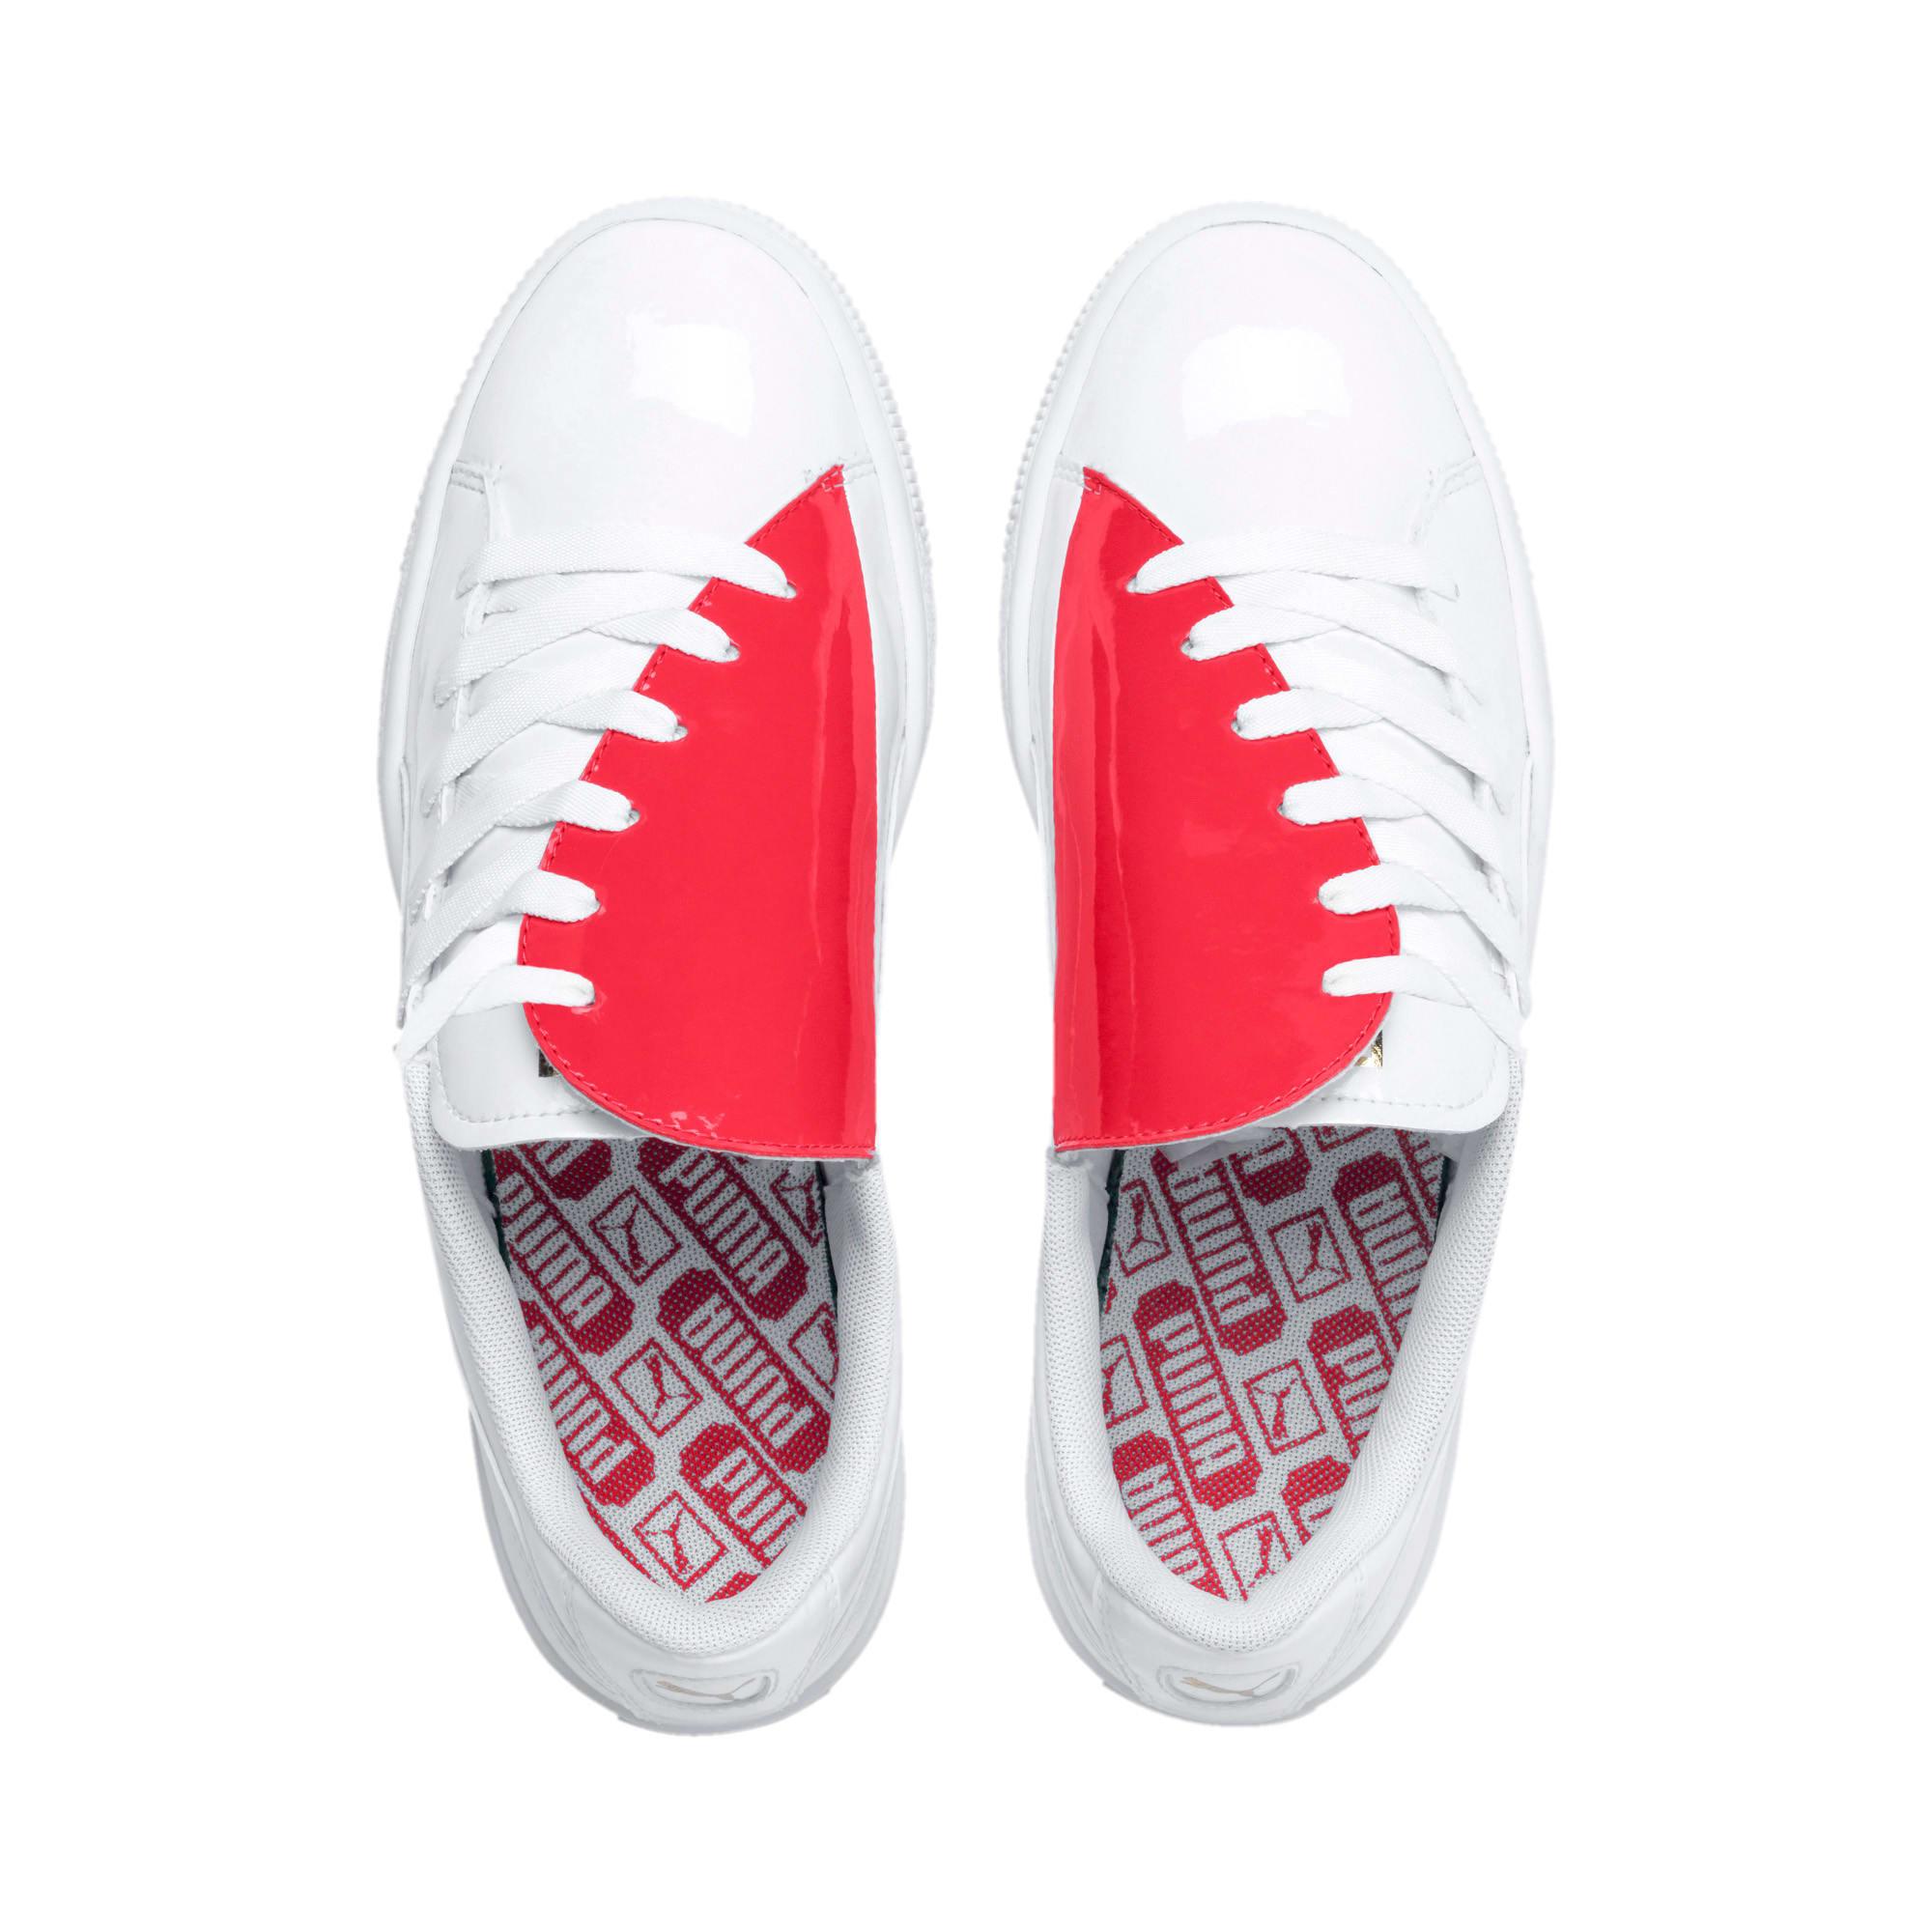 Thumbnail 7 of Basket Crush Women's Sneakers, Puma White-Hibiscus, medium